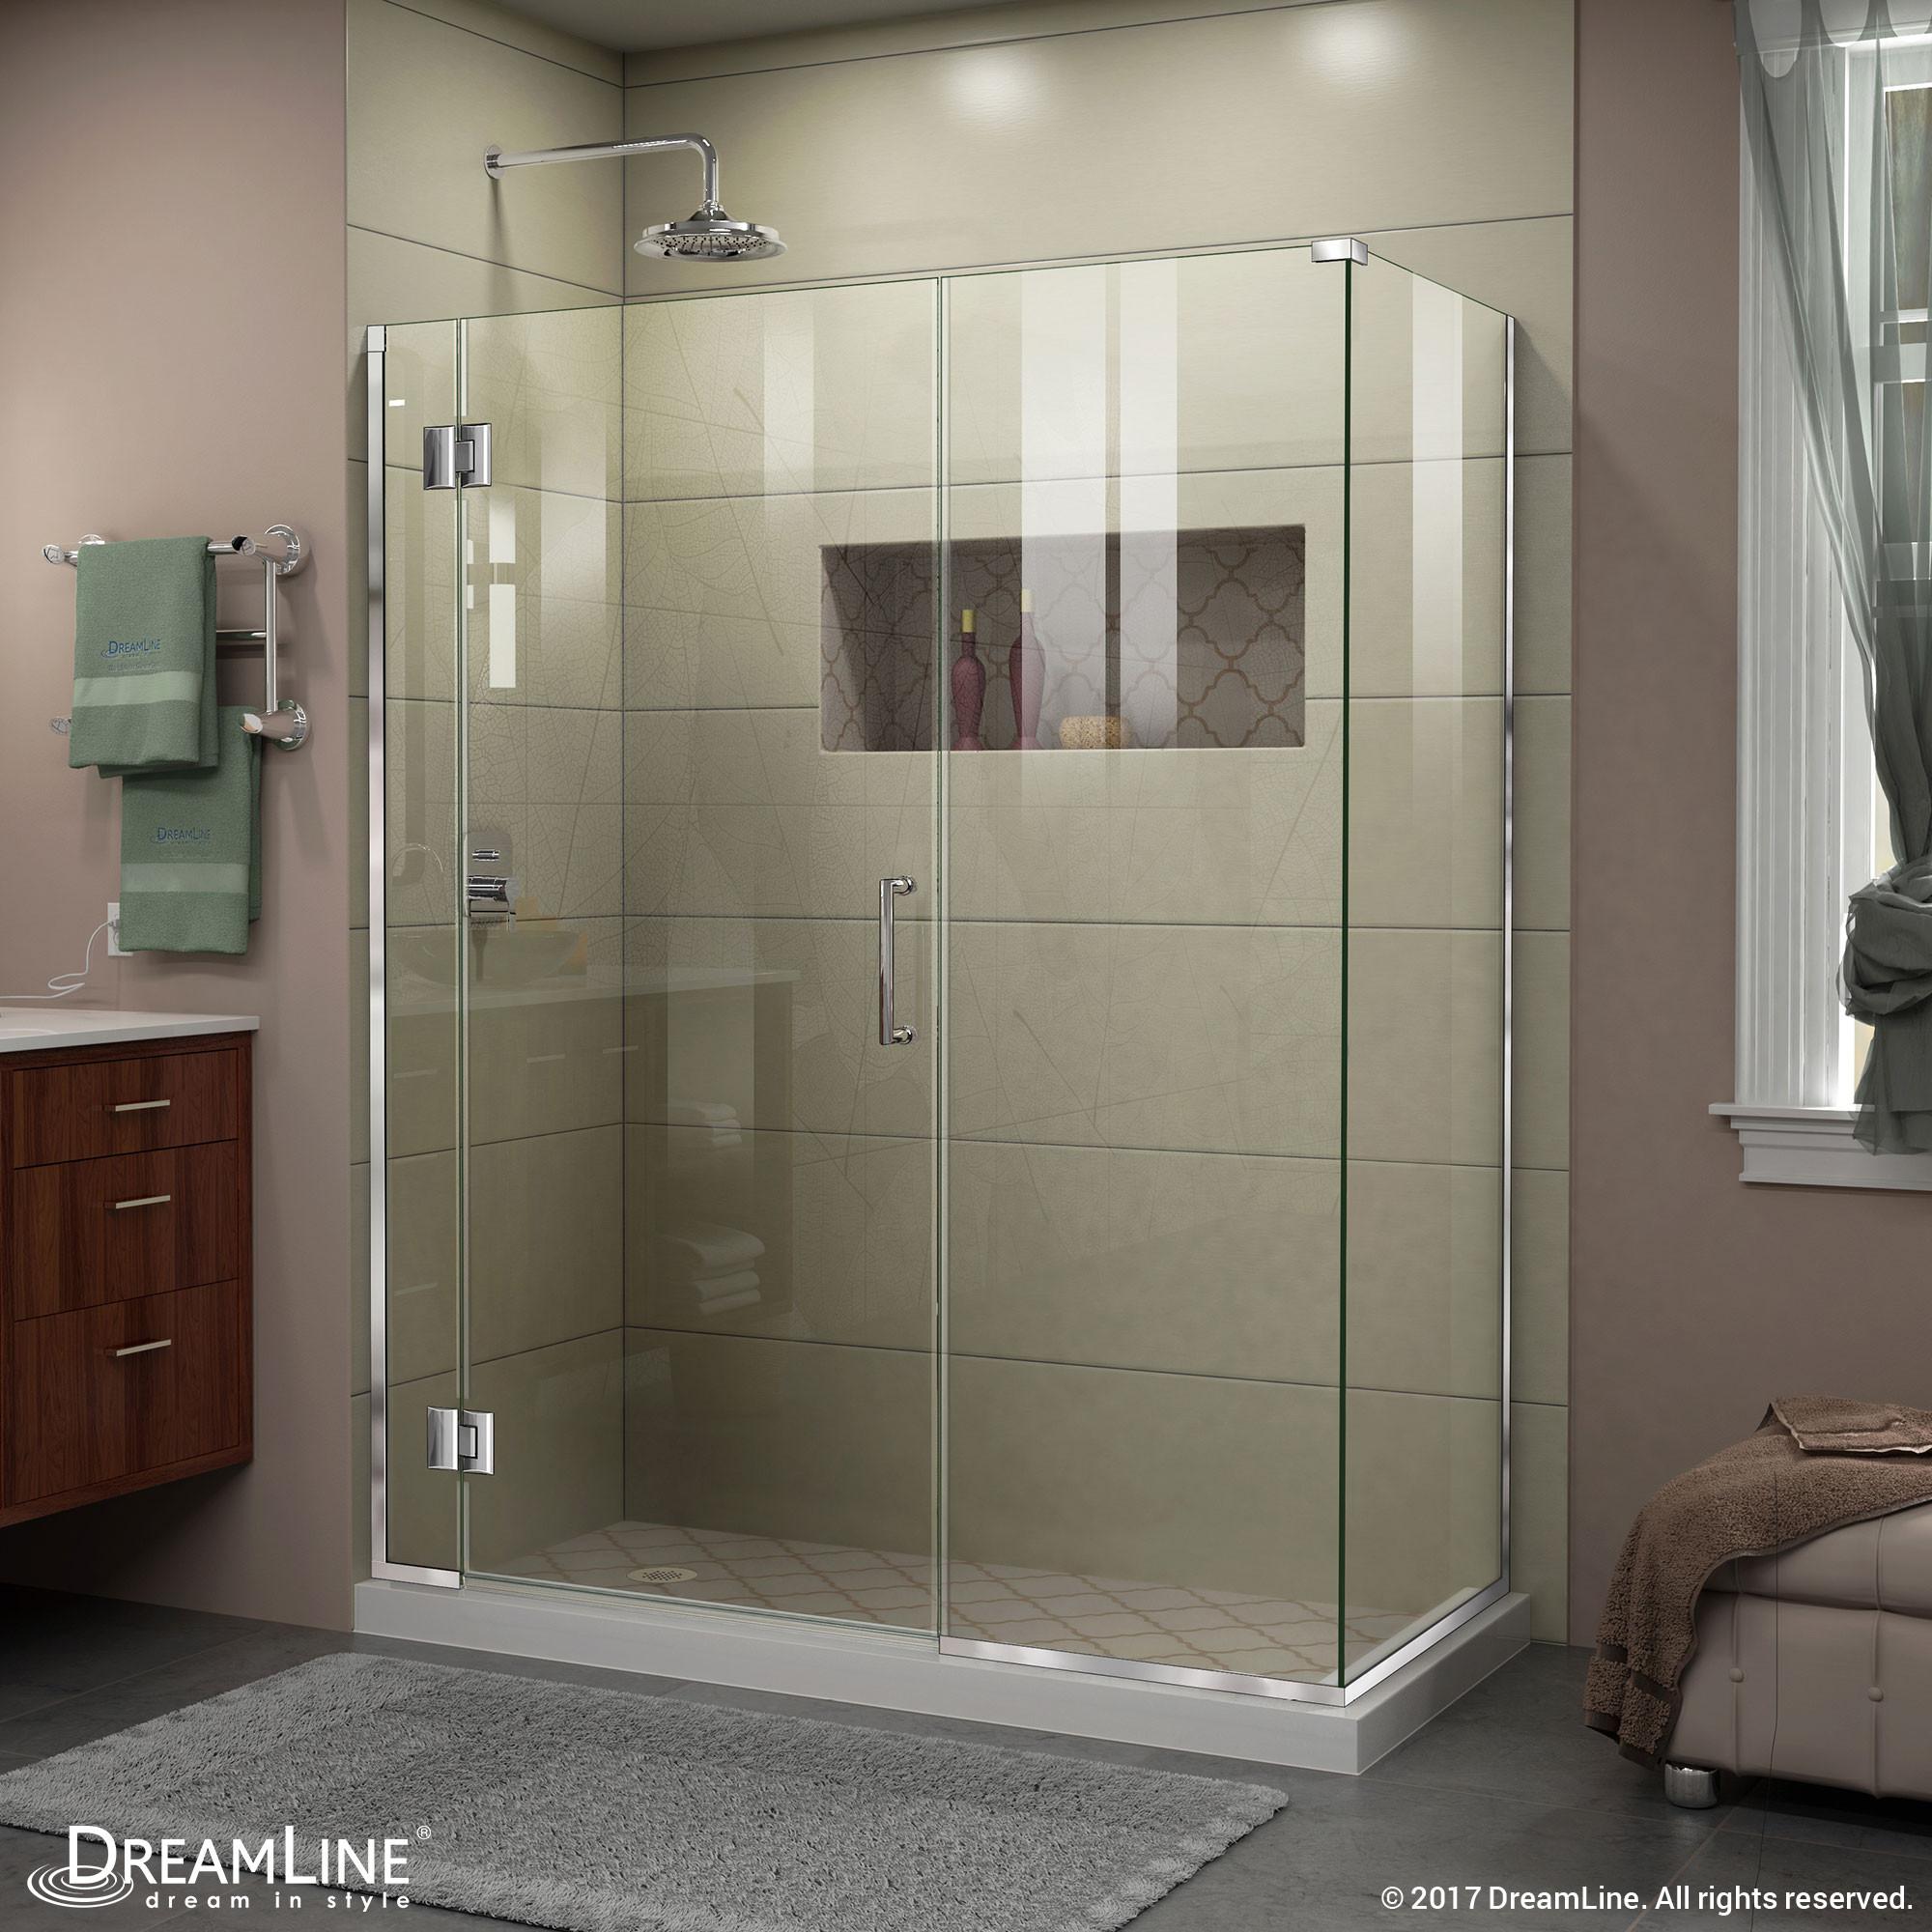 "DreamLine E1251434-01 Unidoor-X 45 x 34.375 x 72"" Hinged Shower Enclosure In Chrome Finish"